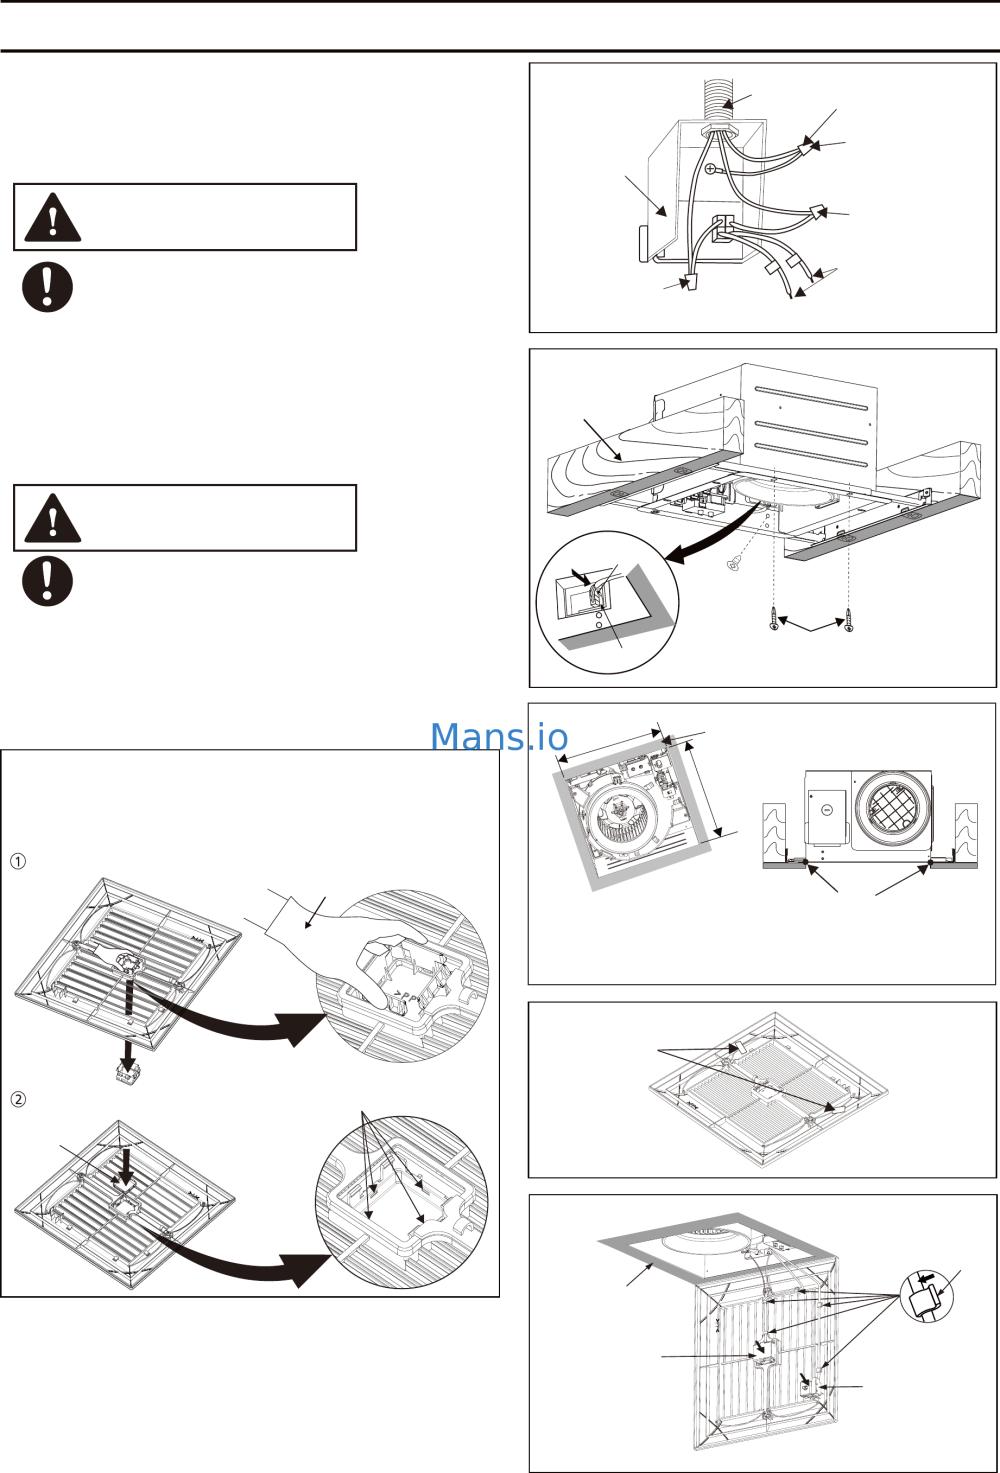 medium resolution of wrg 5531 diagram fv wiring panasonic 0511vk1diagram fv wiring panasonic 0511vk1 21